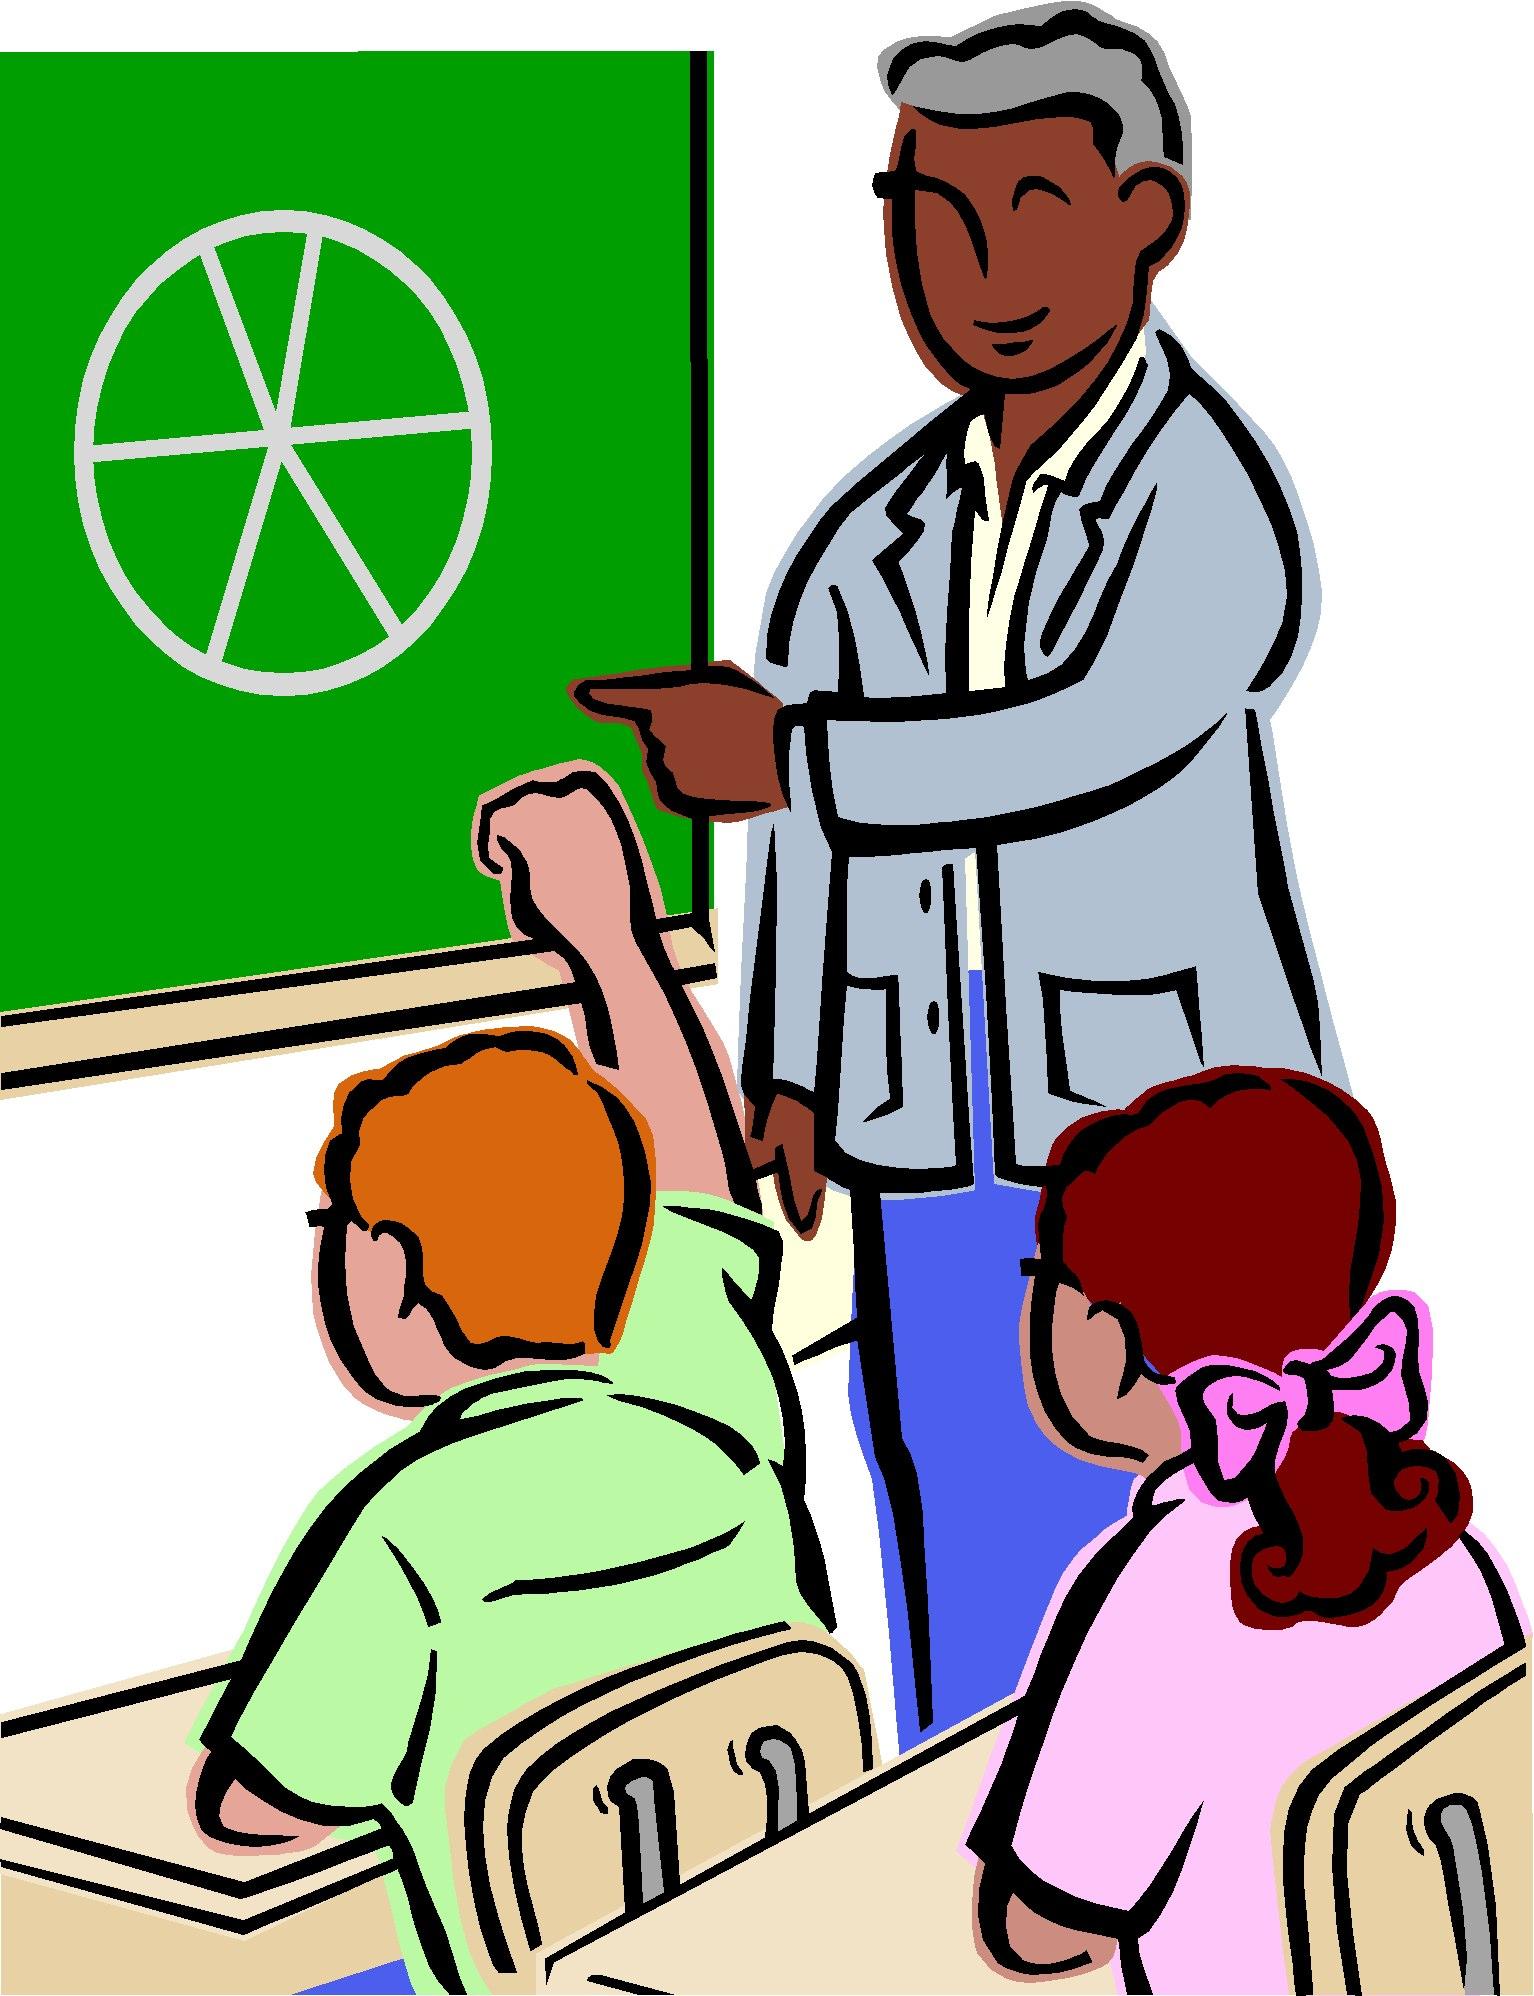 best clipart sites for teachers - photo #49